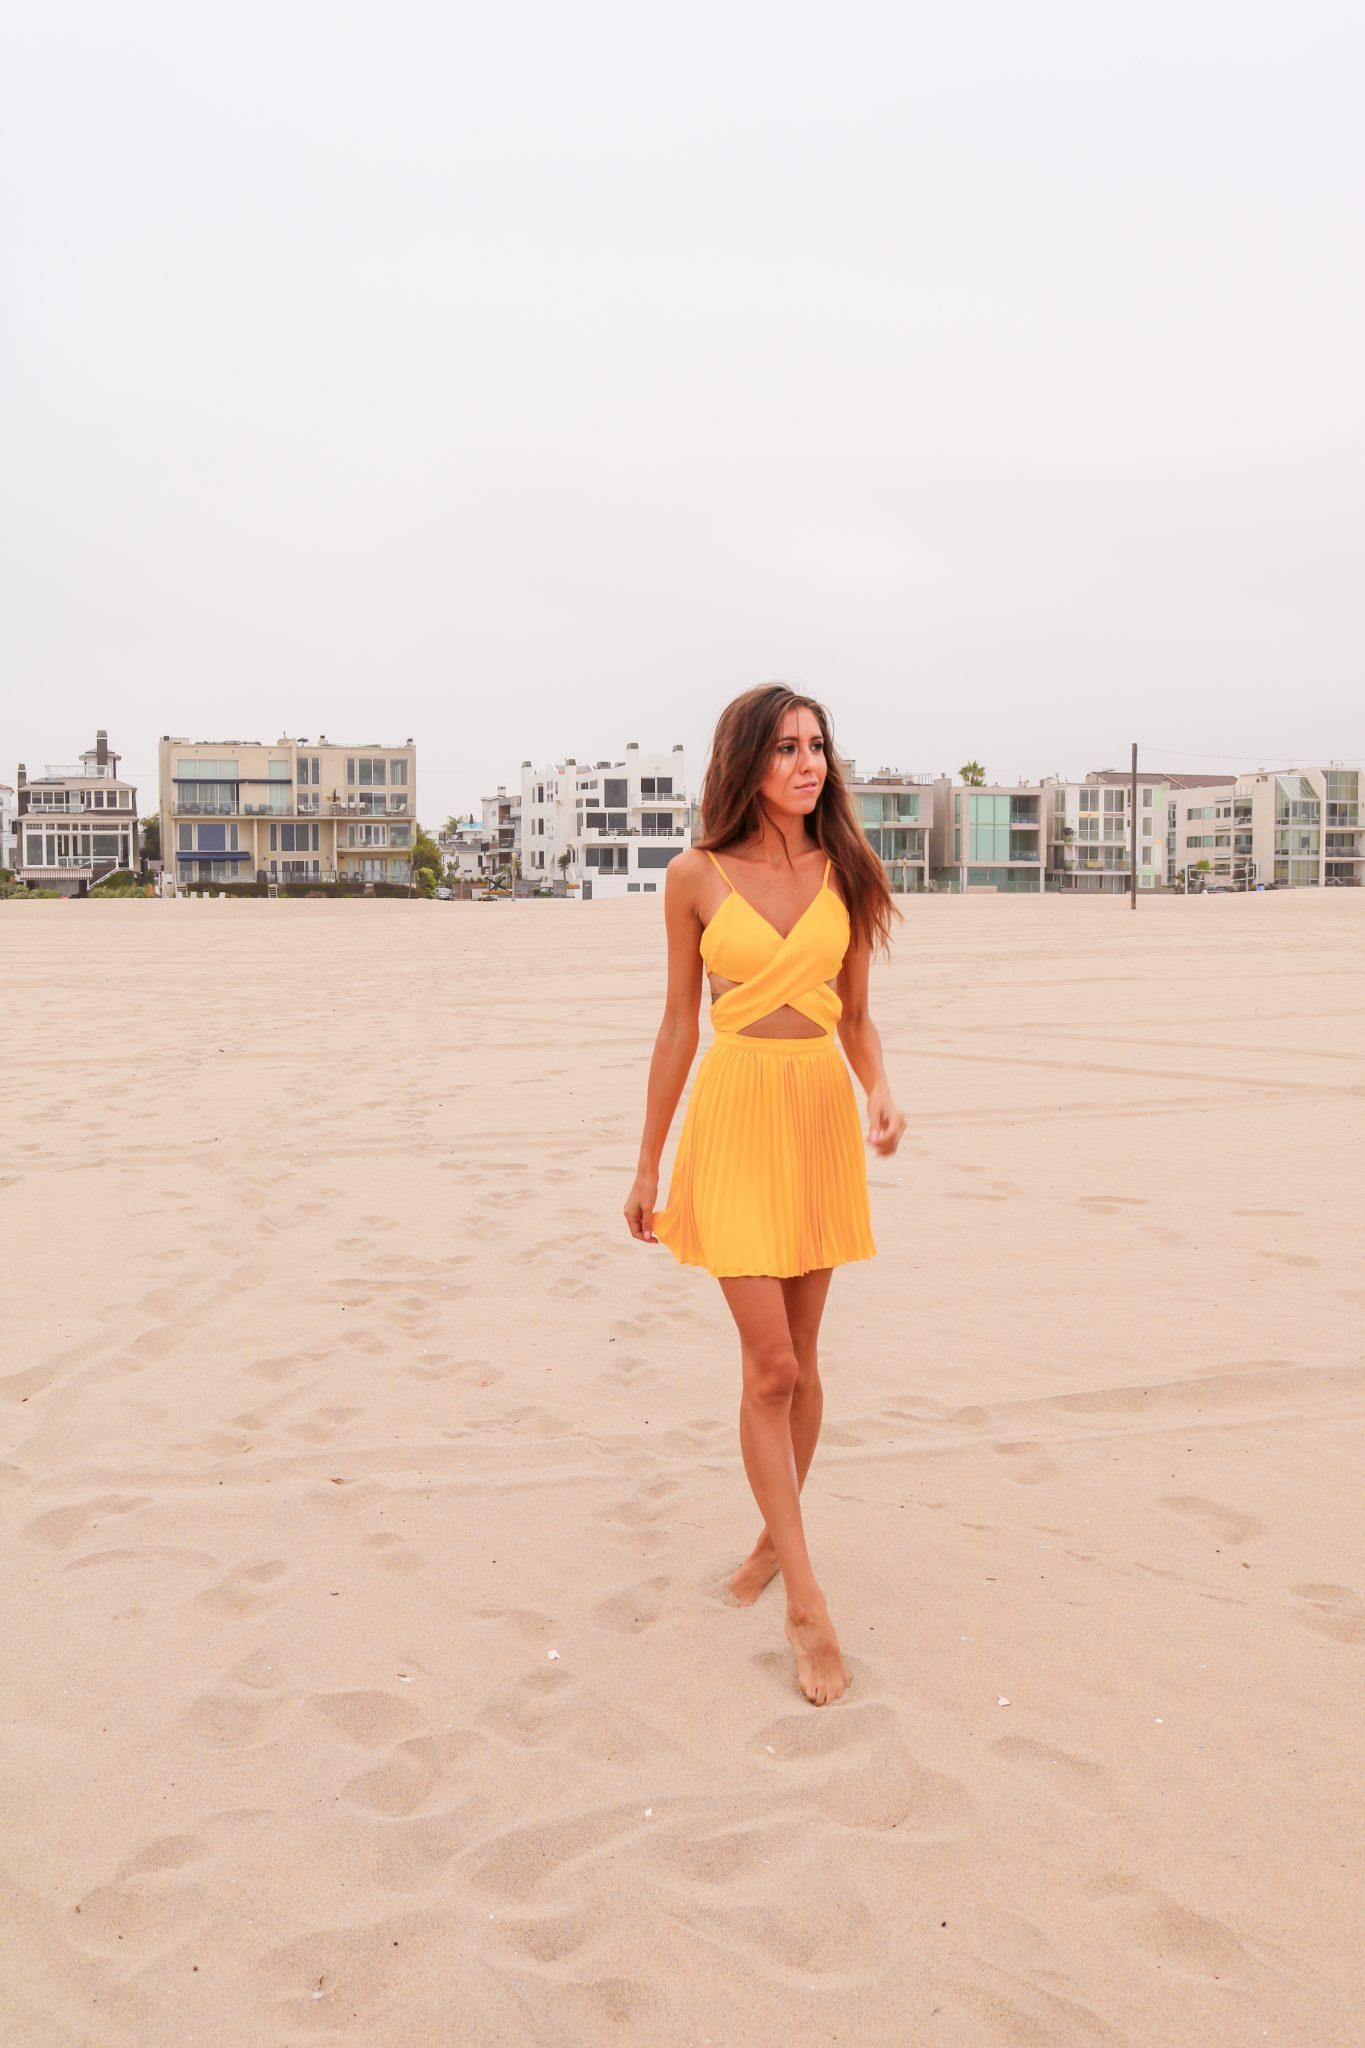 The-Hungarian-Brunette-Yellow-dress-5-of-6.jpg